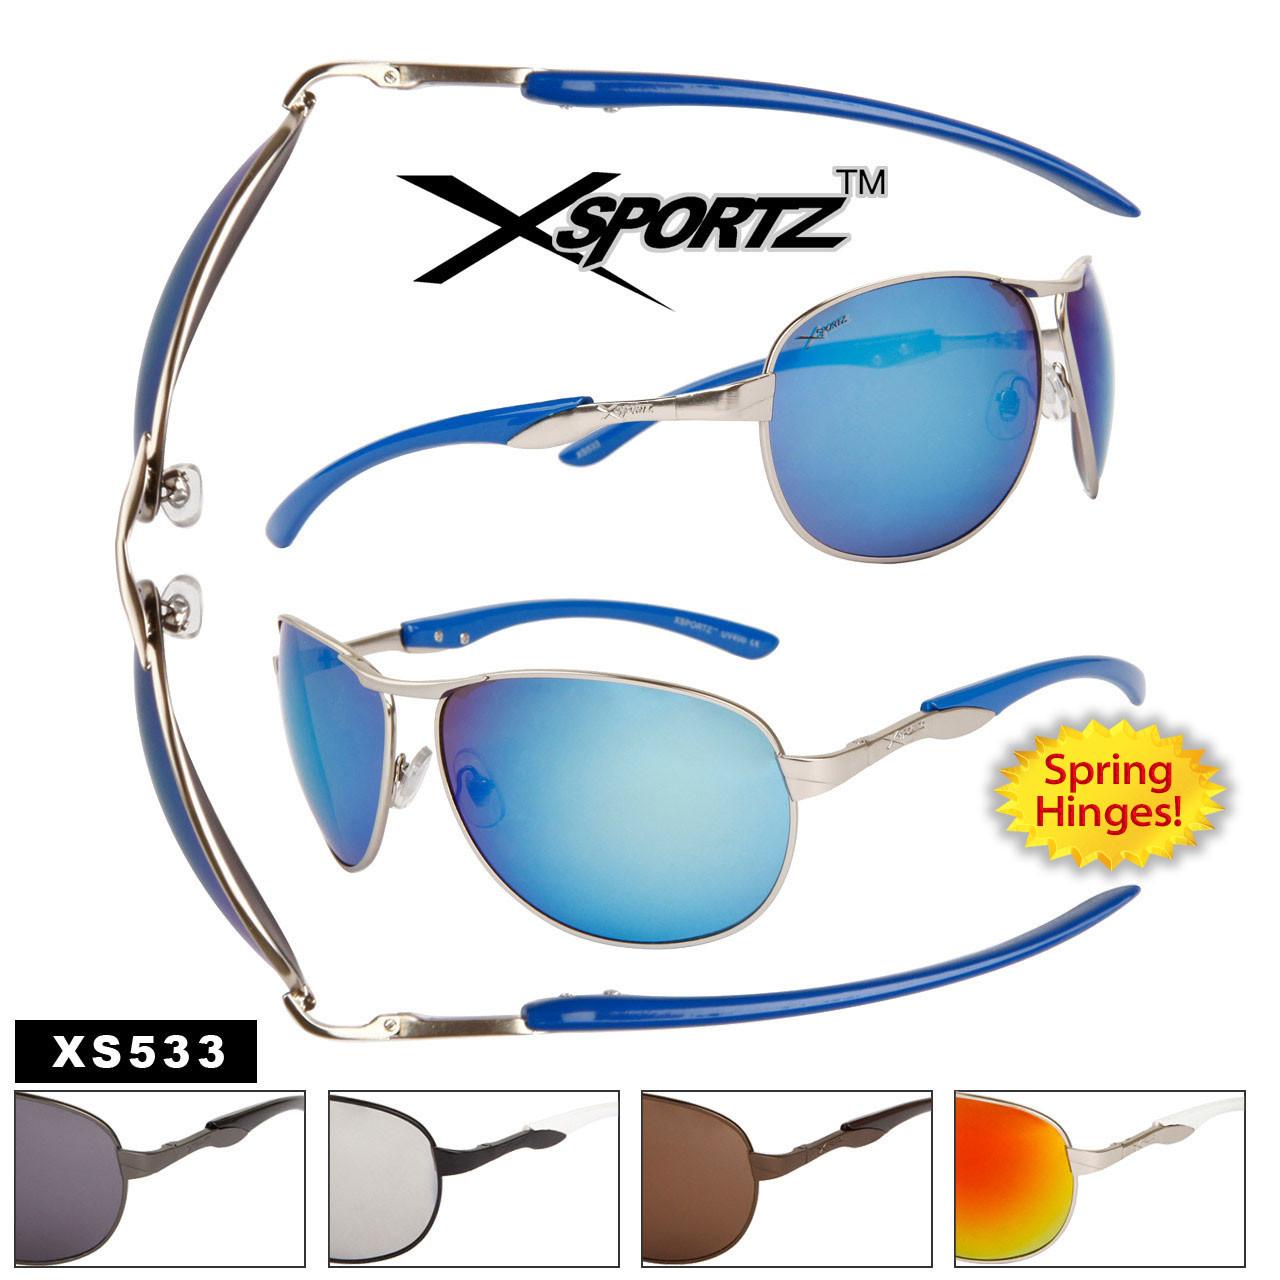 Wholesale Xsportz™ Sunglasses by the Dozen - Style # XS533 Spring Hinge Aviators (Assorted Colors) (12 pcs.)